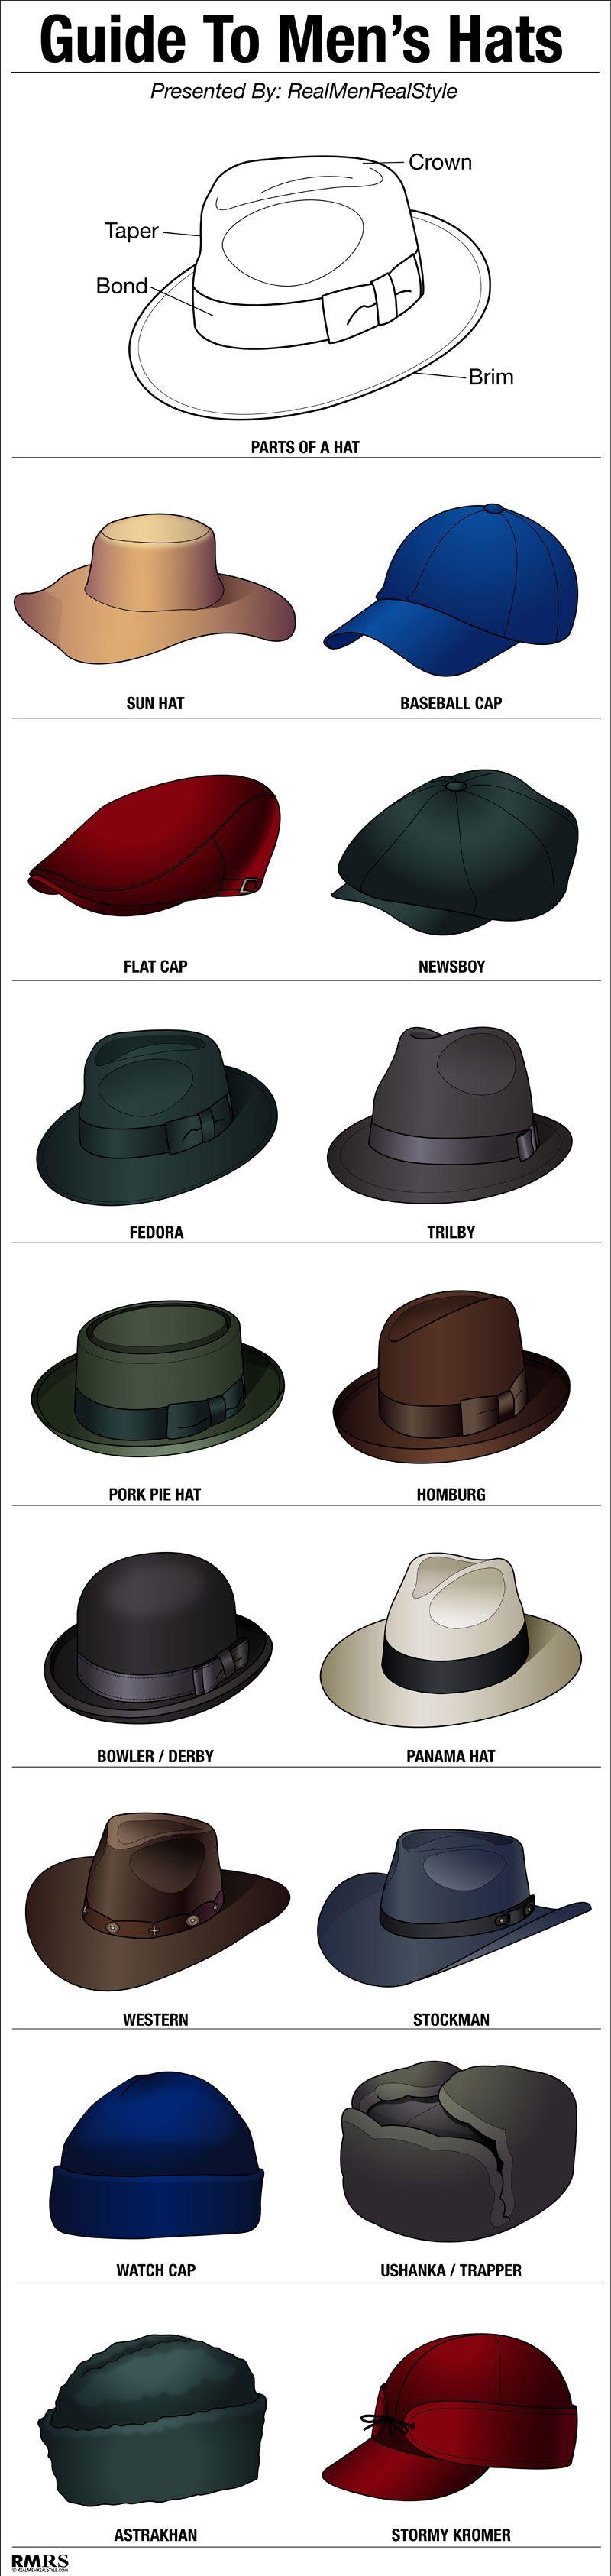 16 Stylish Men S Hats Hat Style Guide Man S Headwear Infographic Hats For Men Stylish Mens Hat Stylish Men